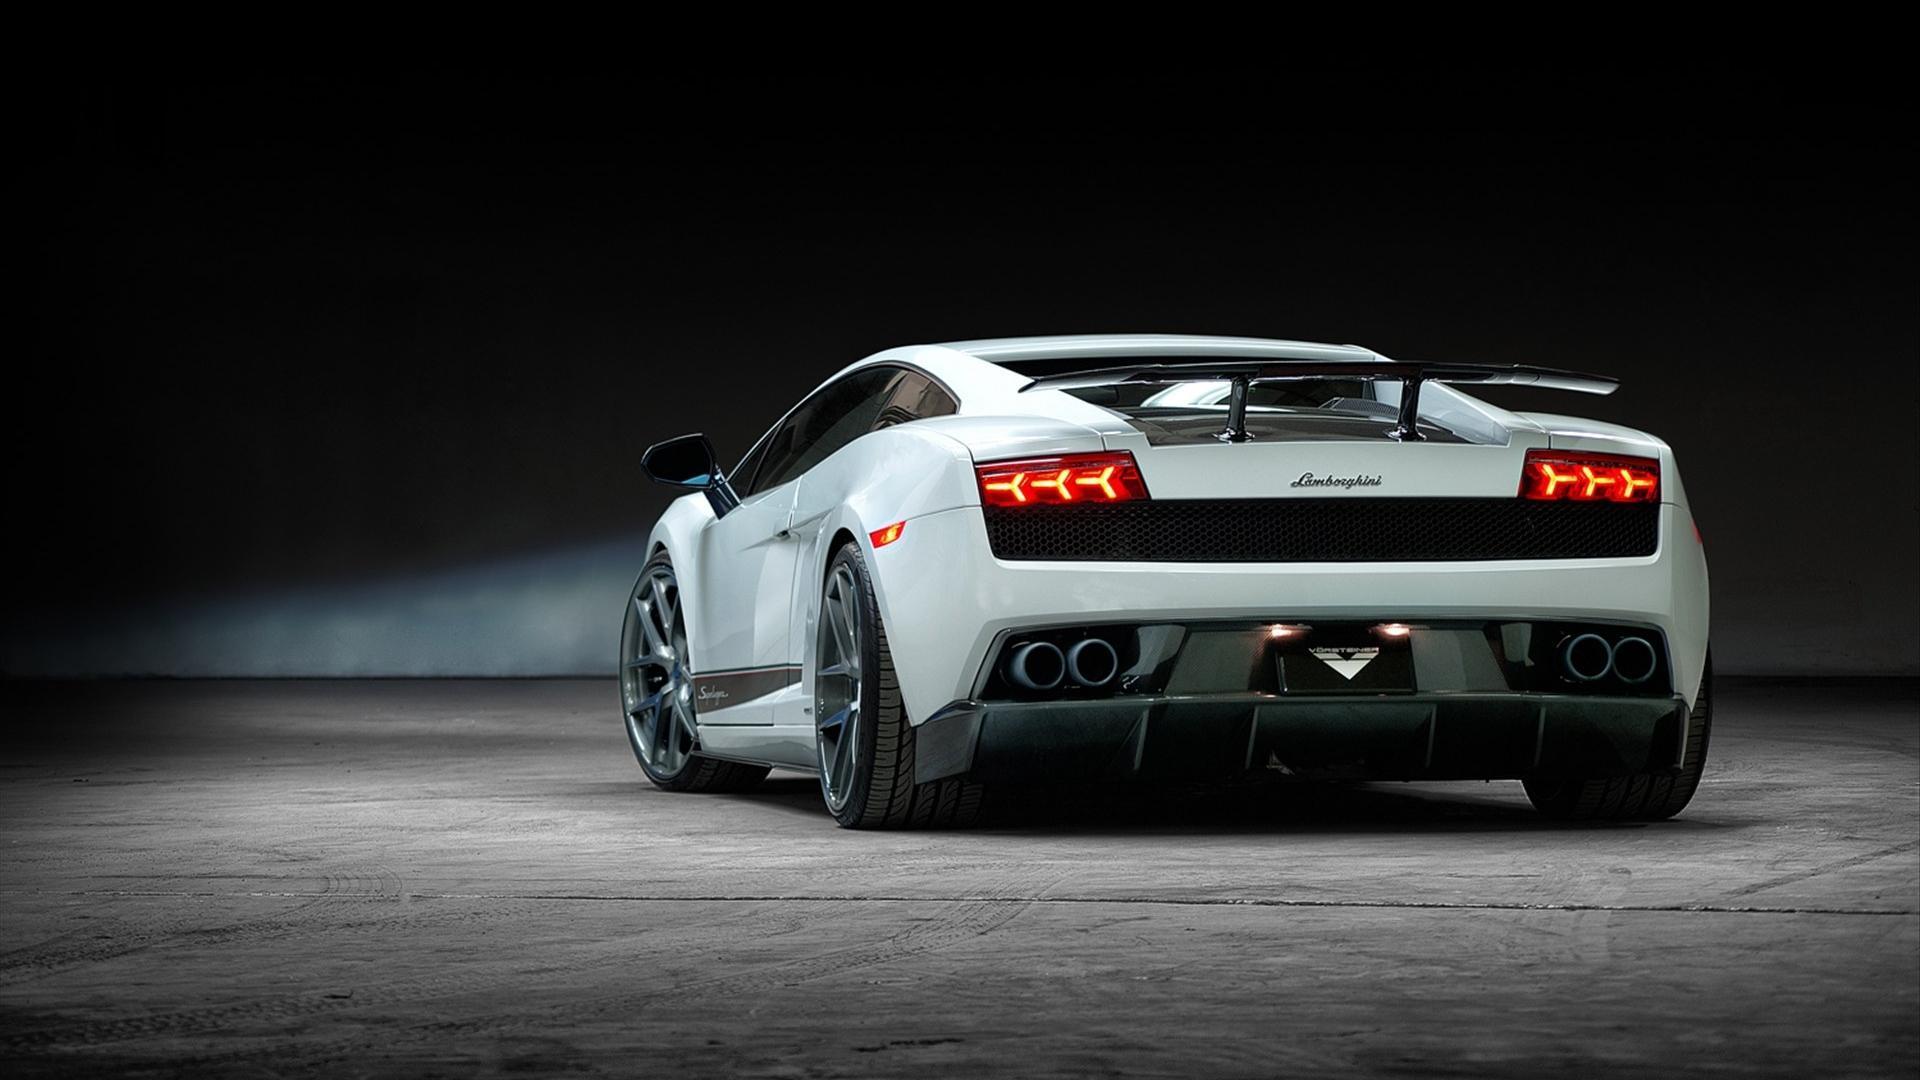 Superb Wallpapers For U003e Lamborghini Gallardo Hd Wallpapers Nice Design